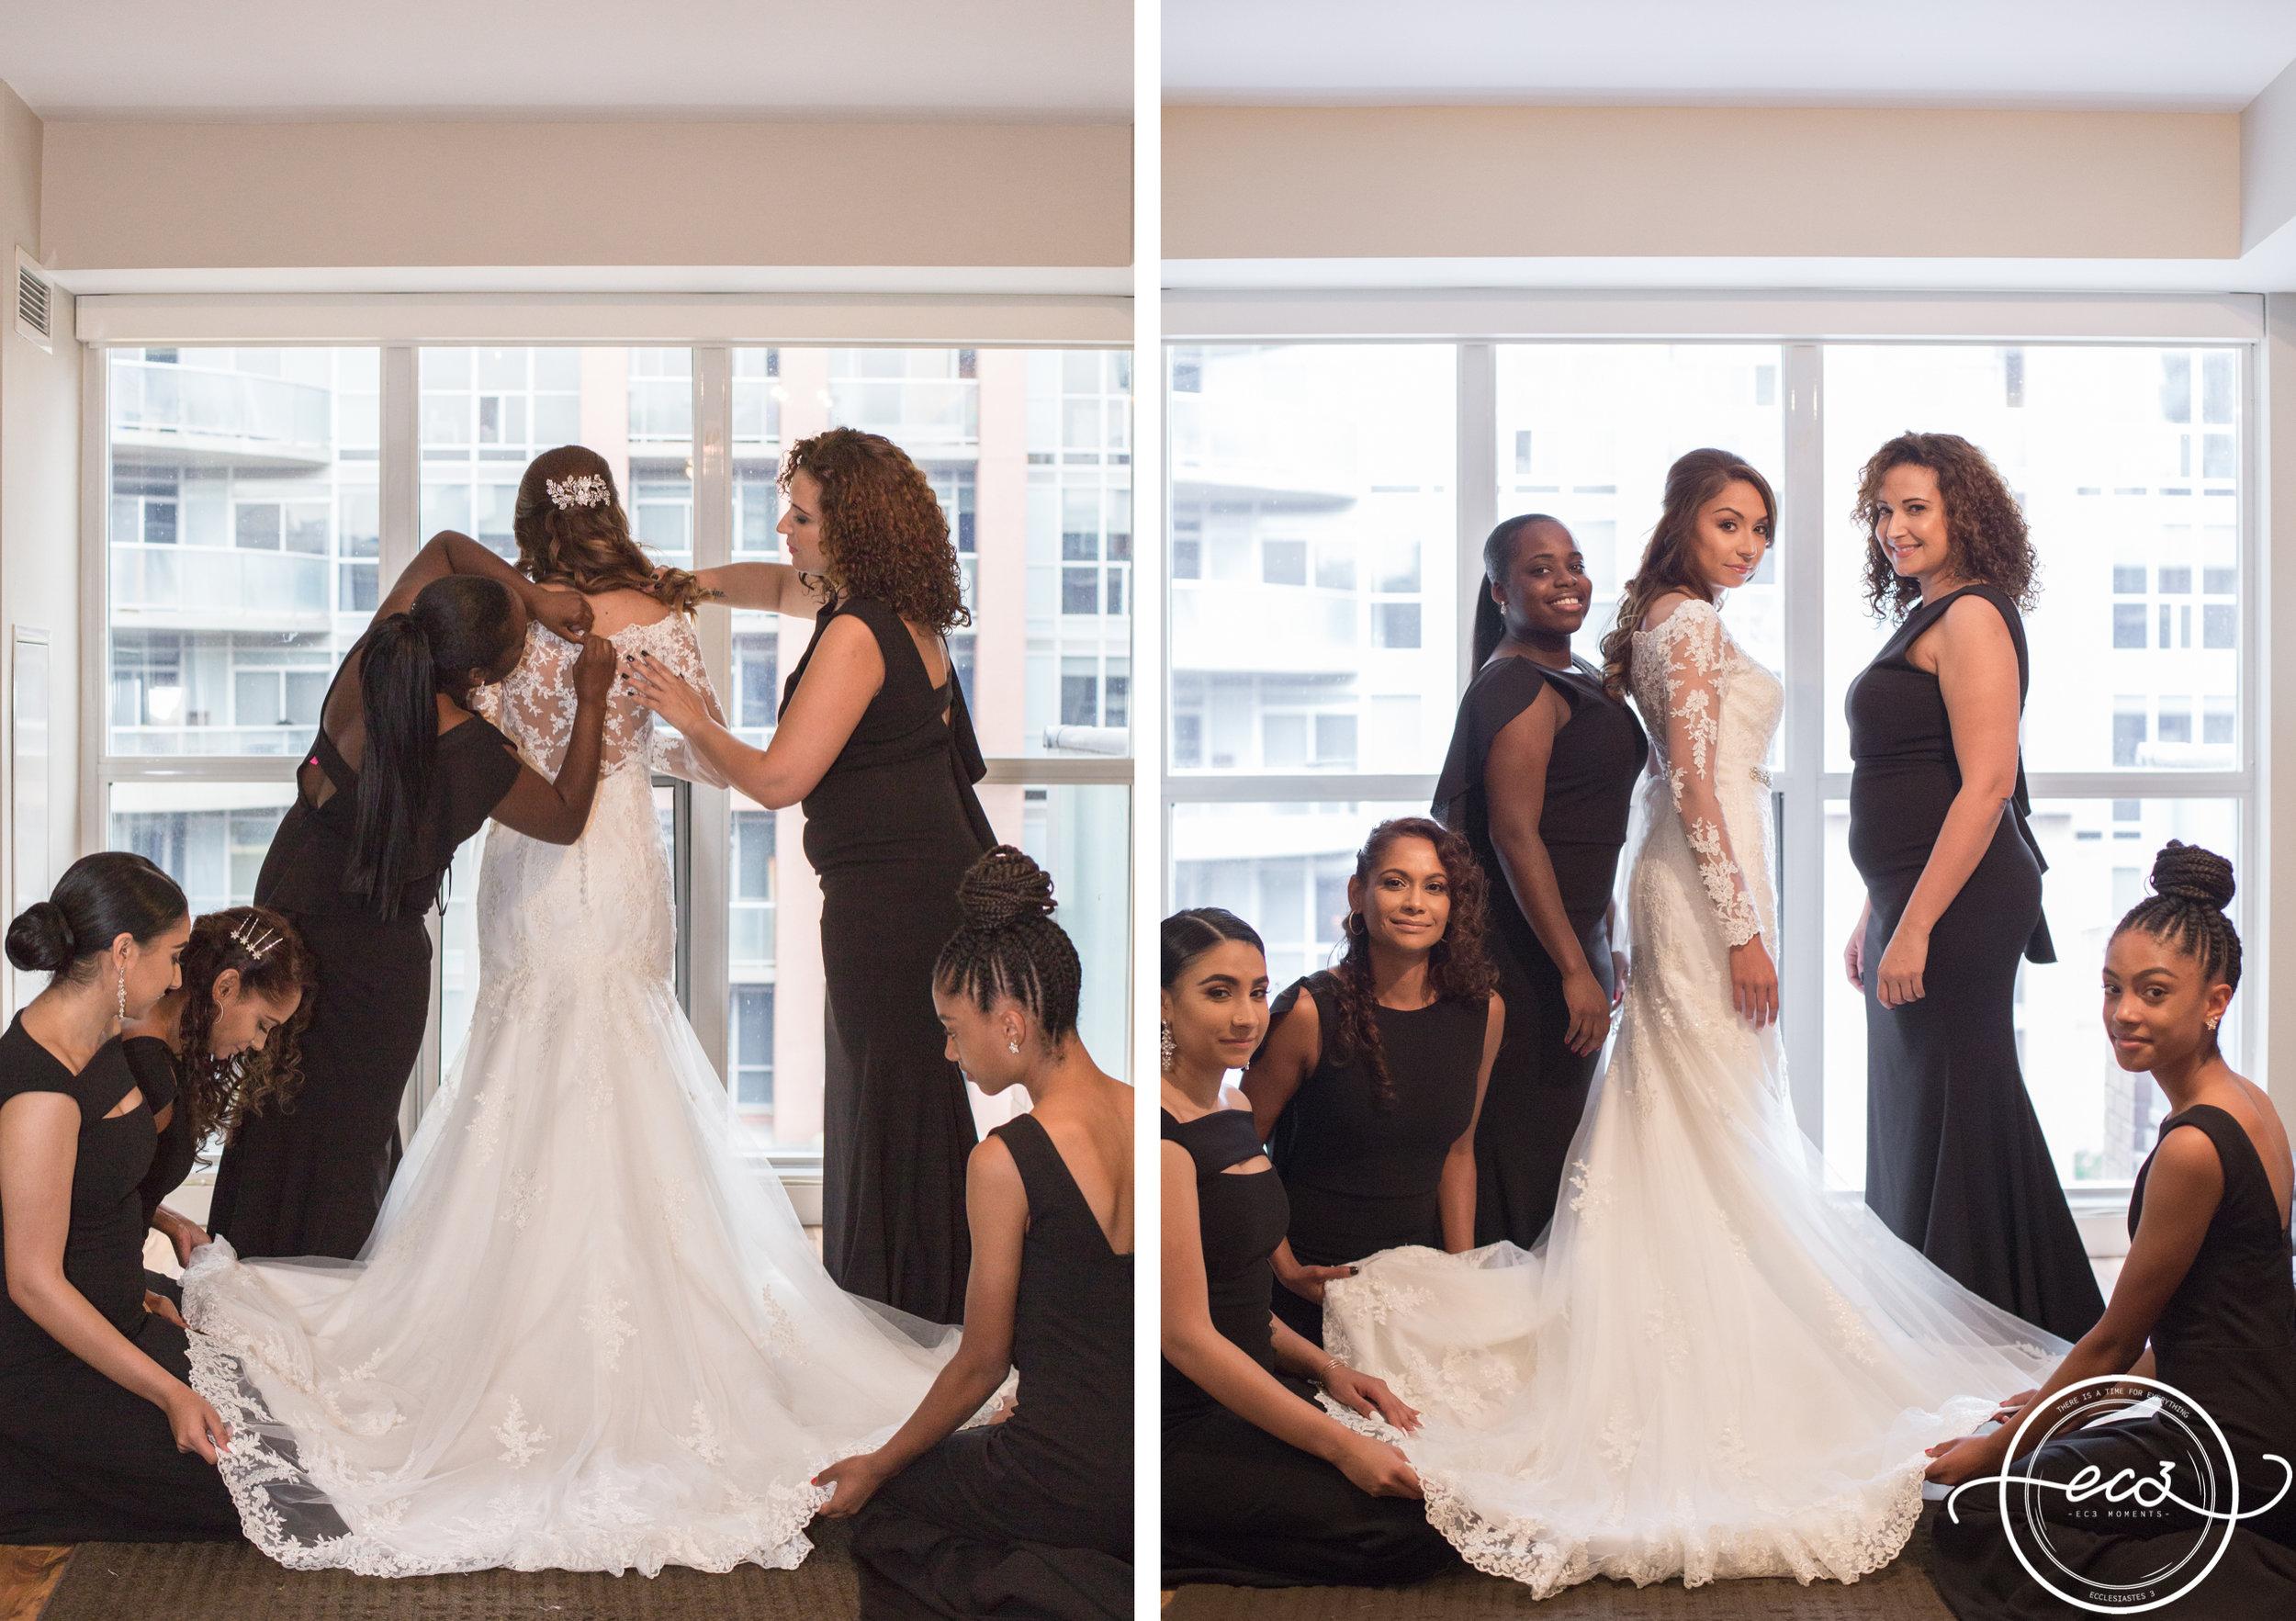 AA-Rustic-Toronto-Burroughes-Wedding12.jpg